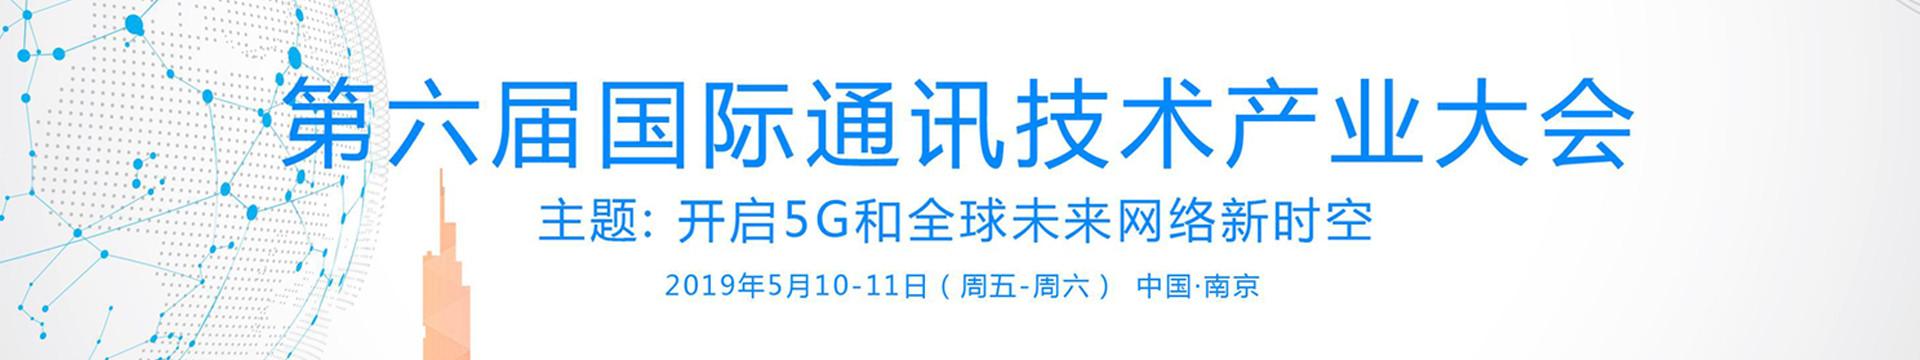 InfoTech 2019中国(南京)第六届国际通讯技术产业大会